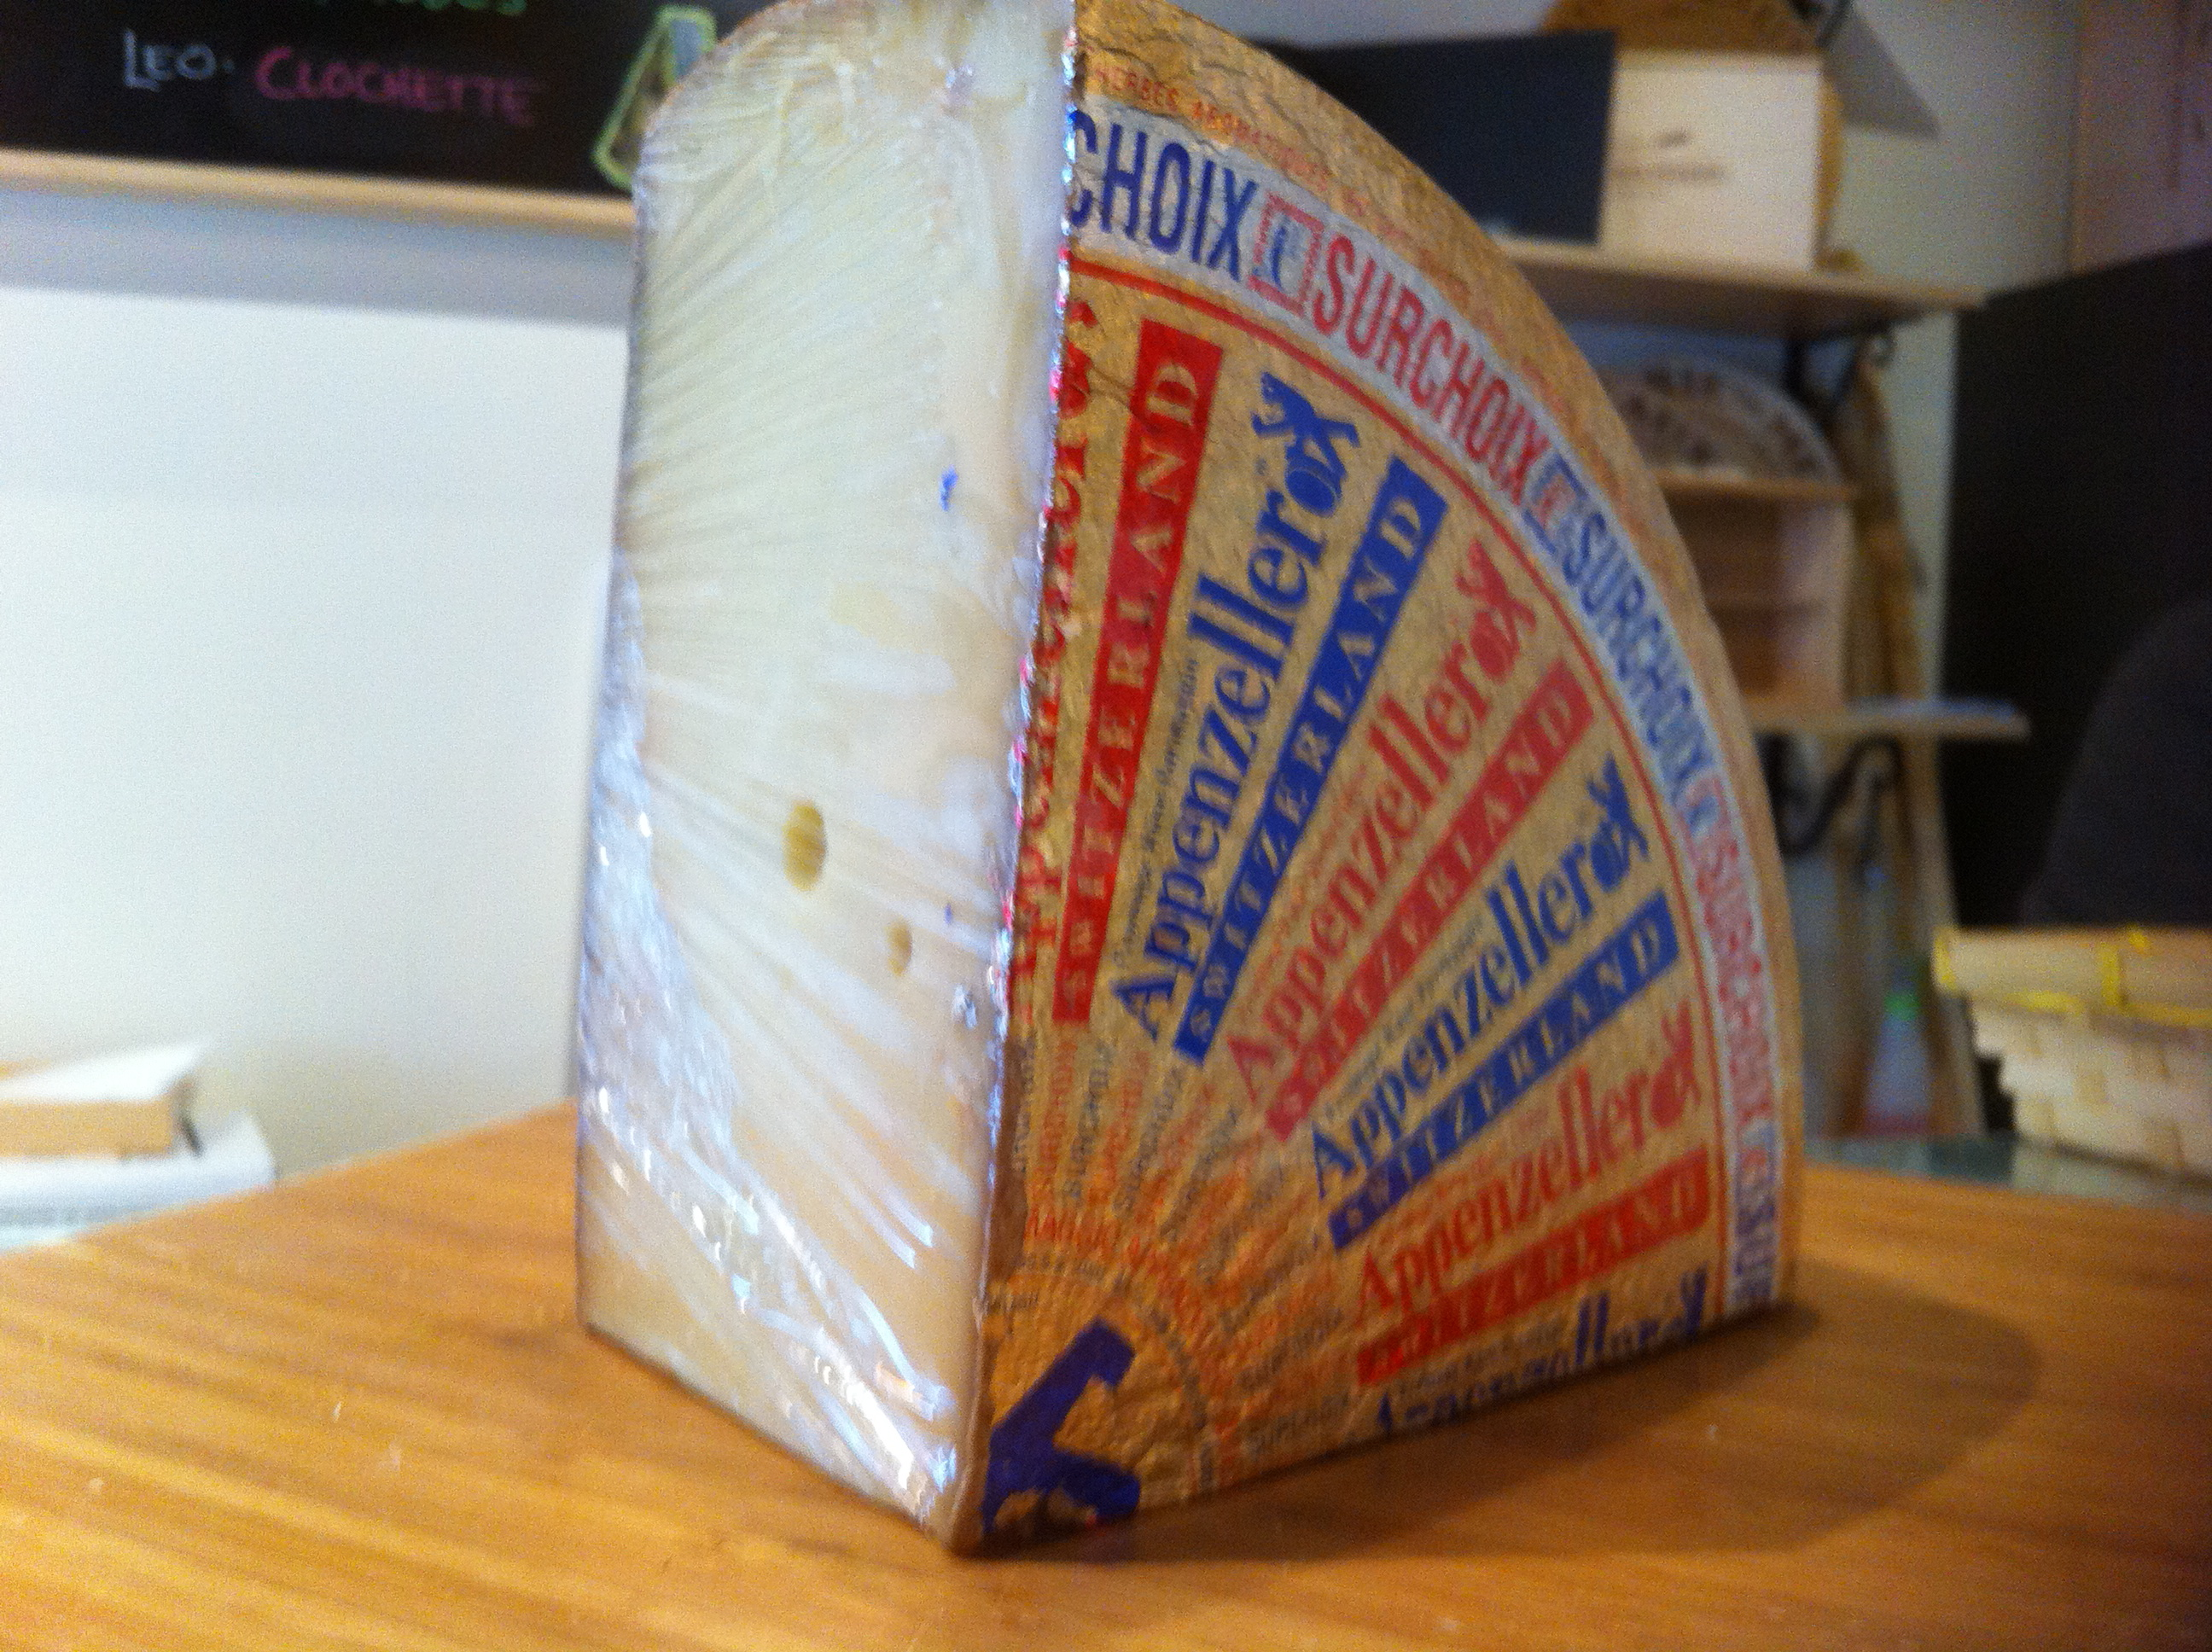 Day 75 Appenzeller Surchoix My Blog Of Cheese